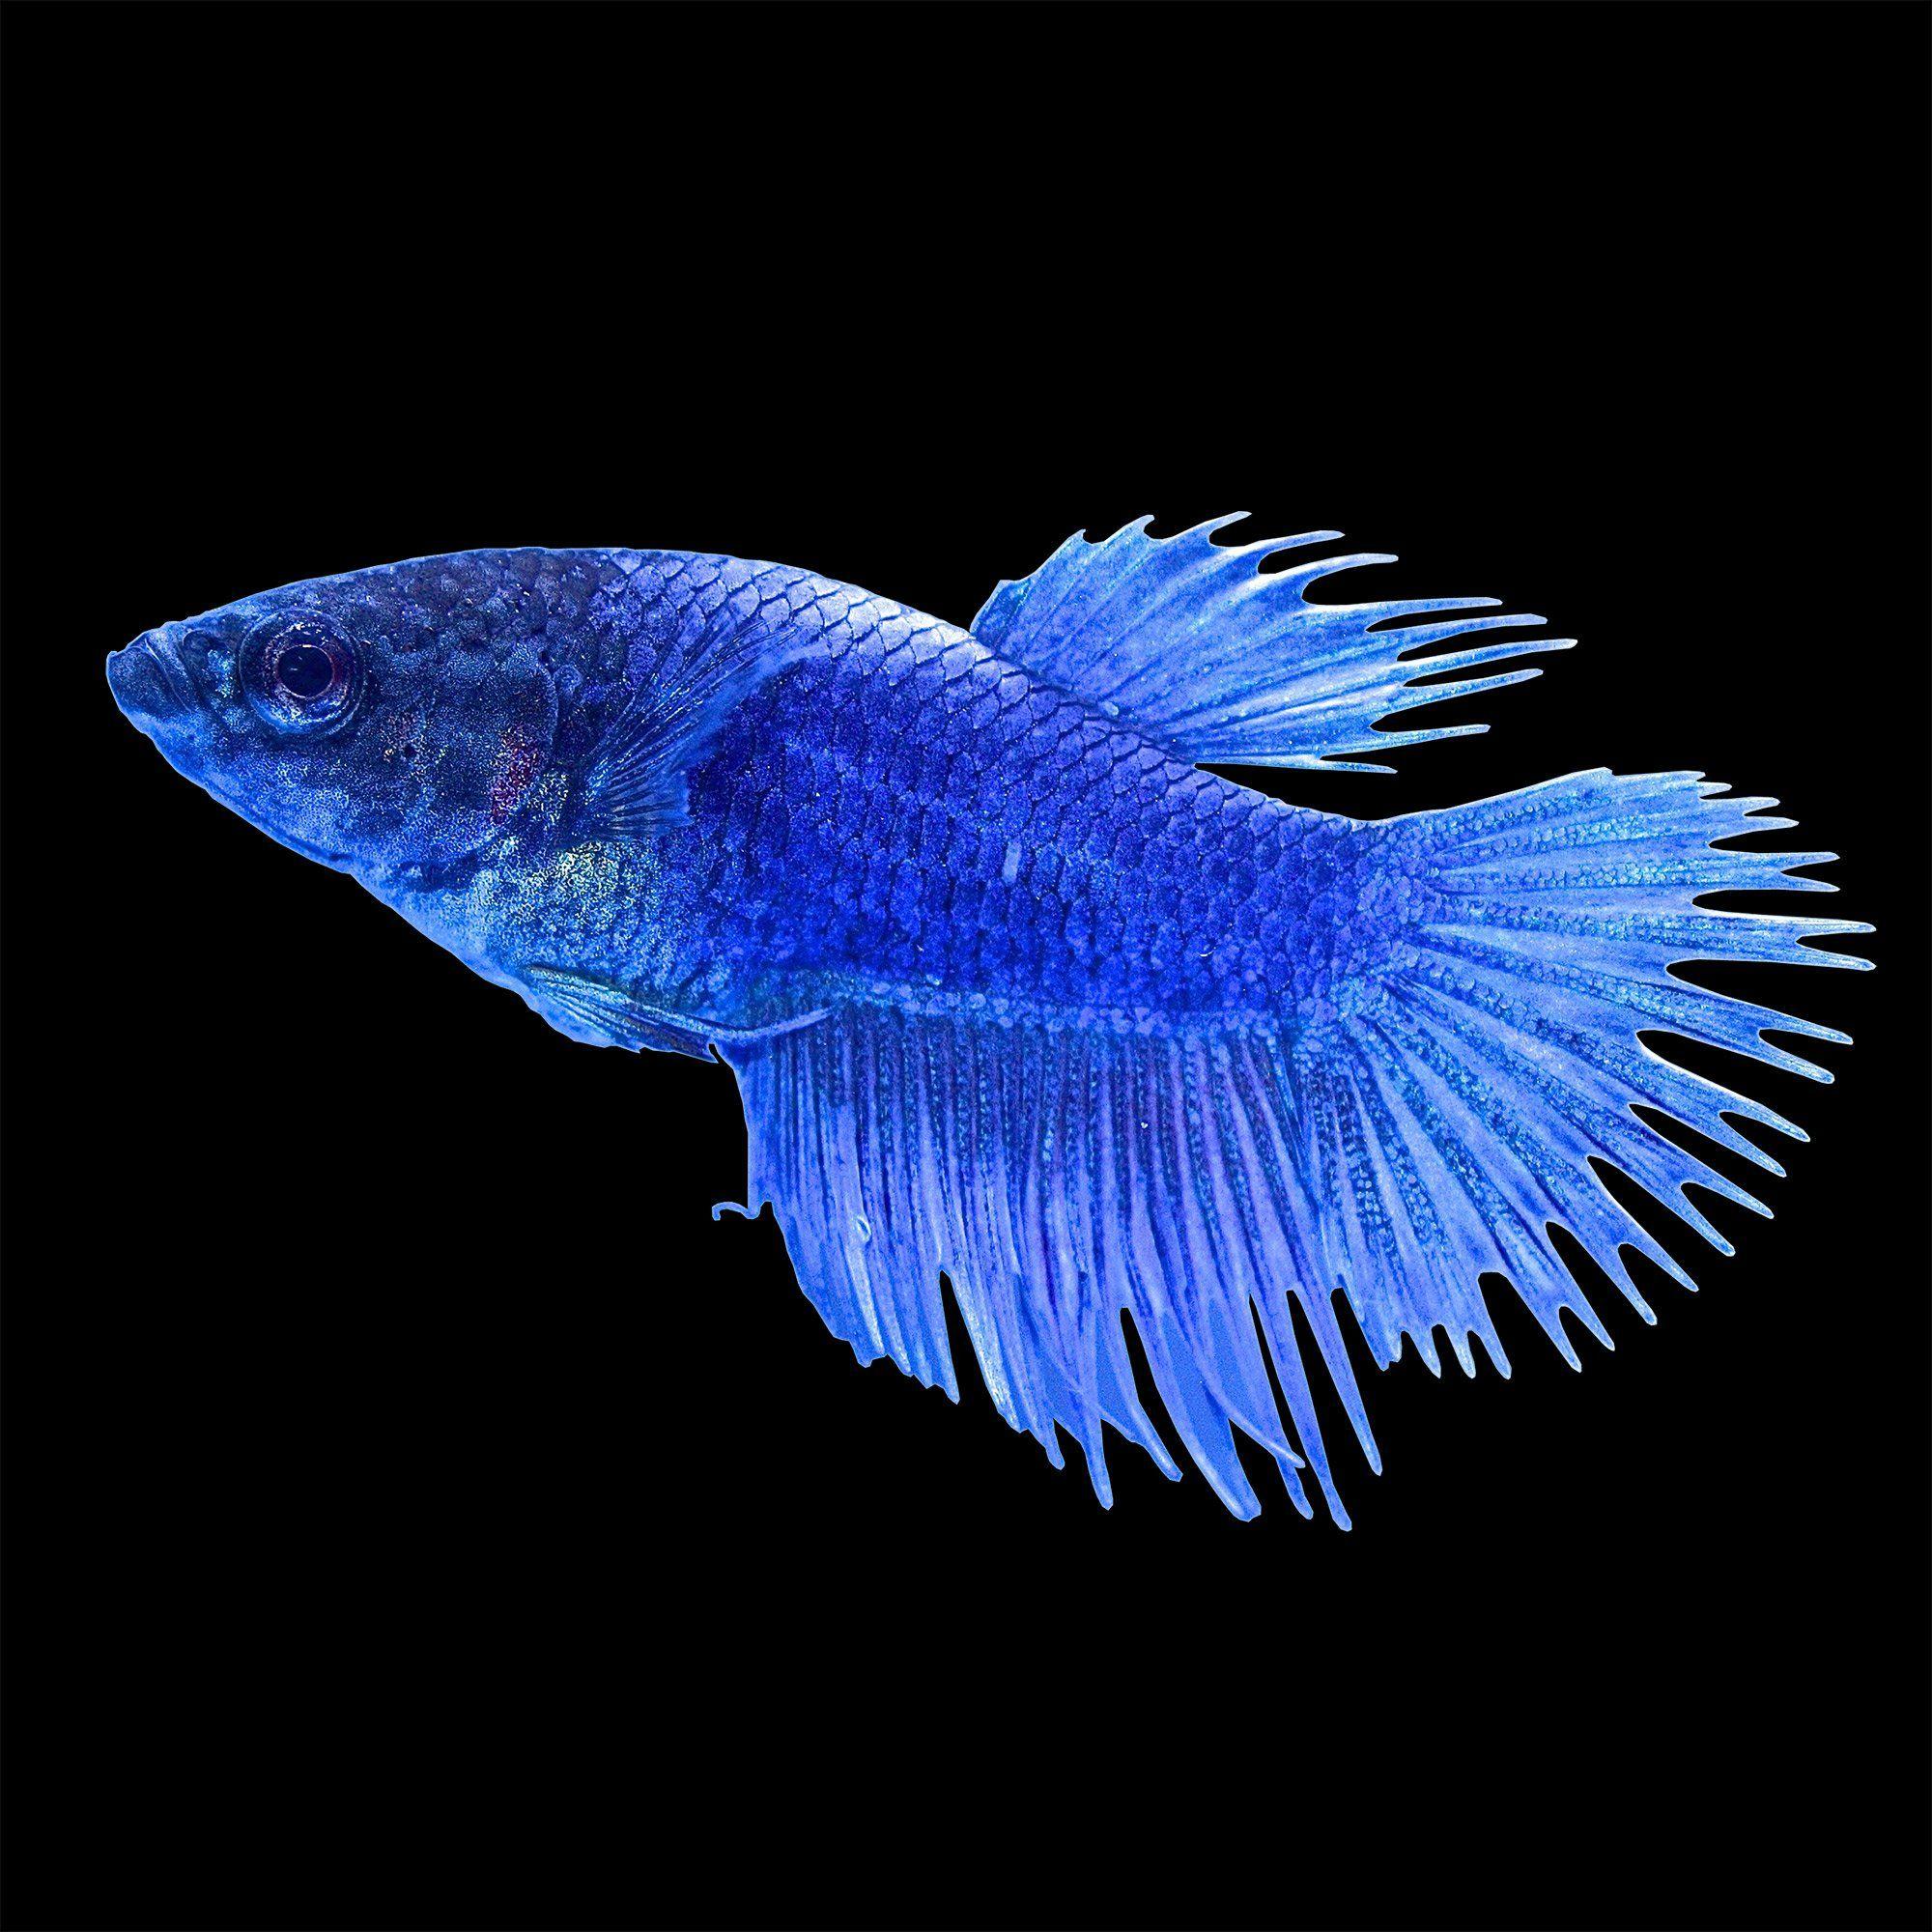 Blue Female Crowntail Betta Fish For Sale Order Online Petco Betta Fish Betta Siamese Fighting Fish